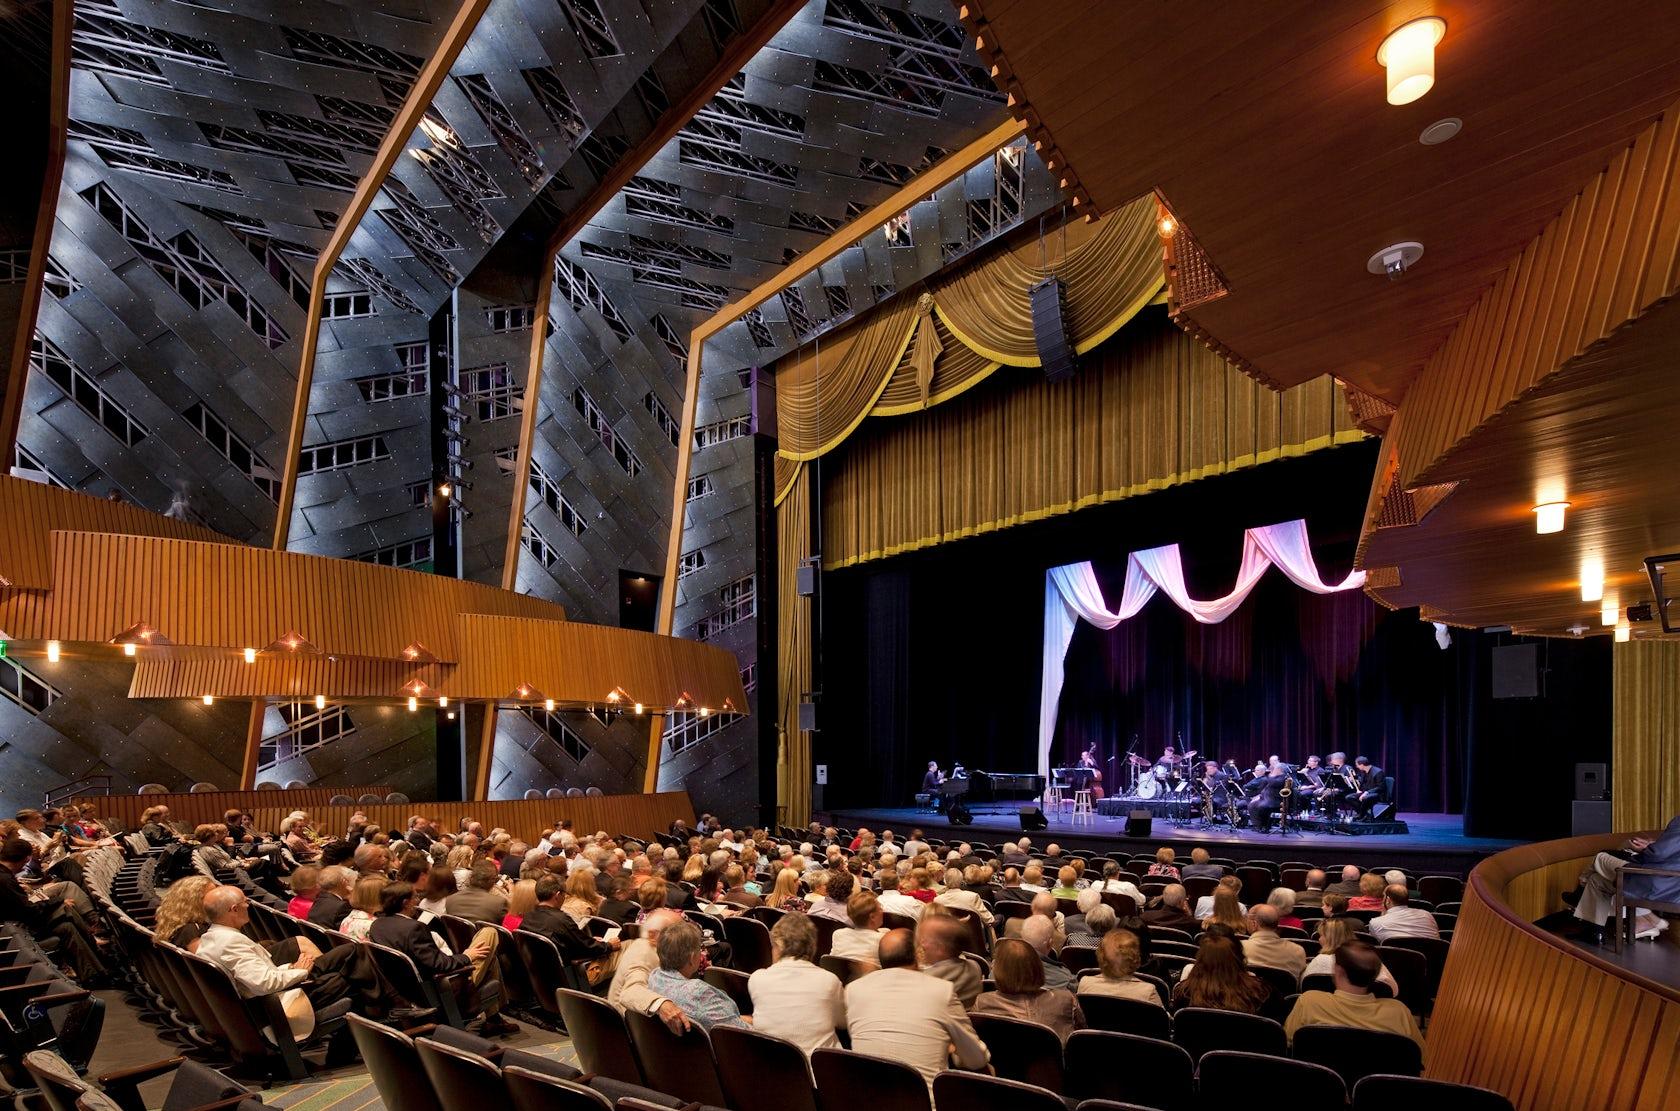 Francis Marion University Performing Arts Center Architizer